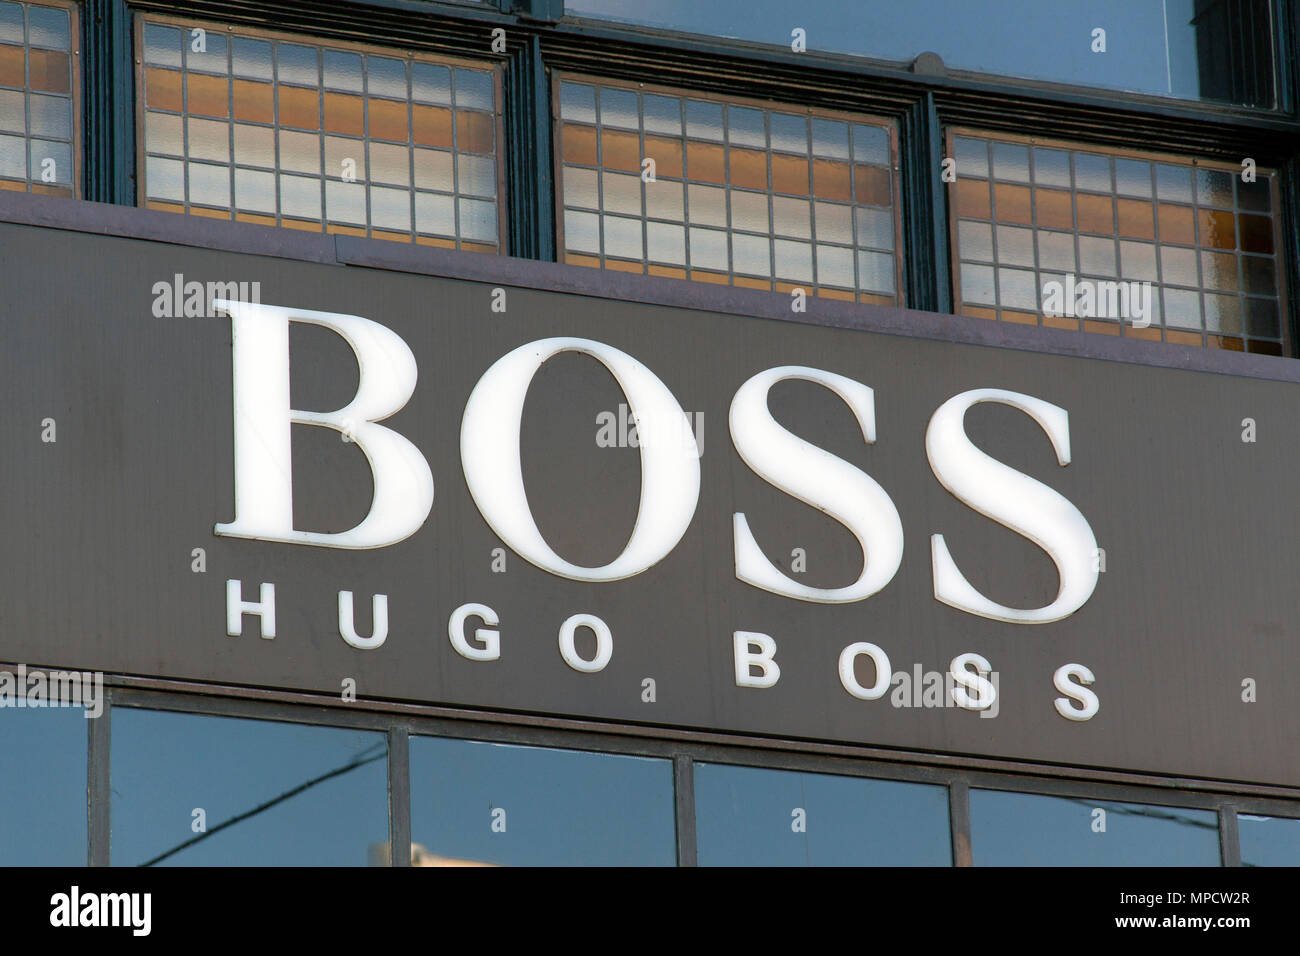 Amsterdam, Netherlands-october 10, 2015: Facade of the hugo boss store in Amsterdam - Stock Image